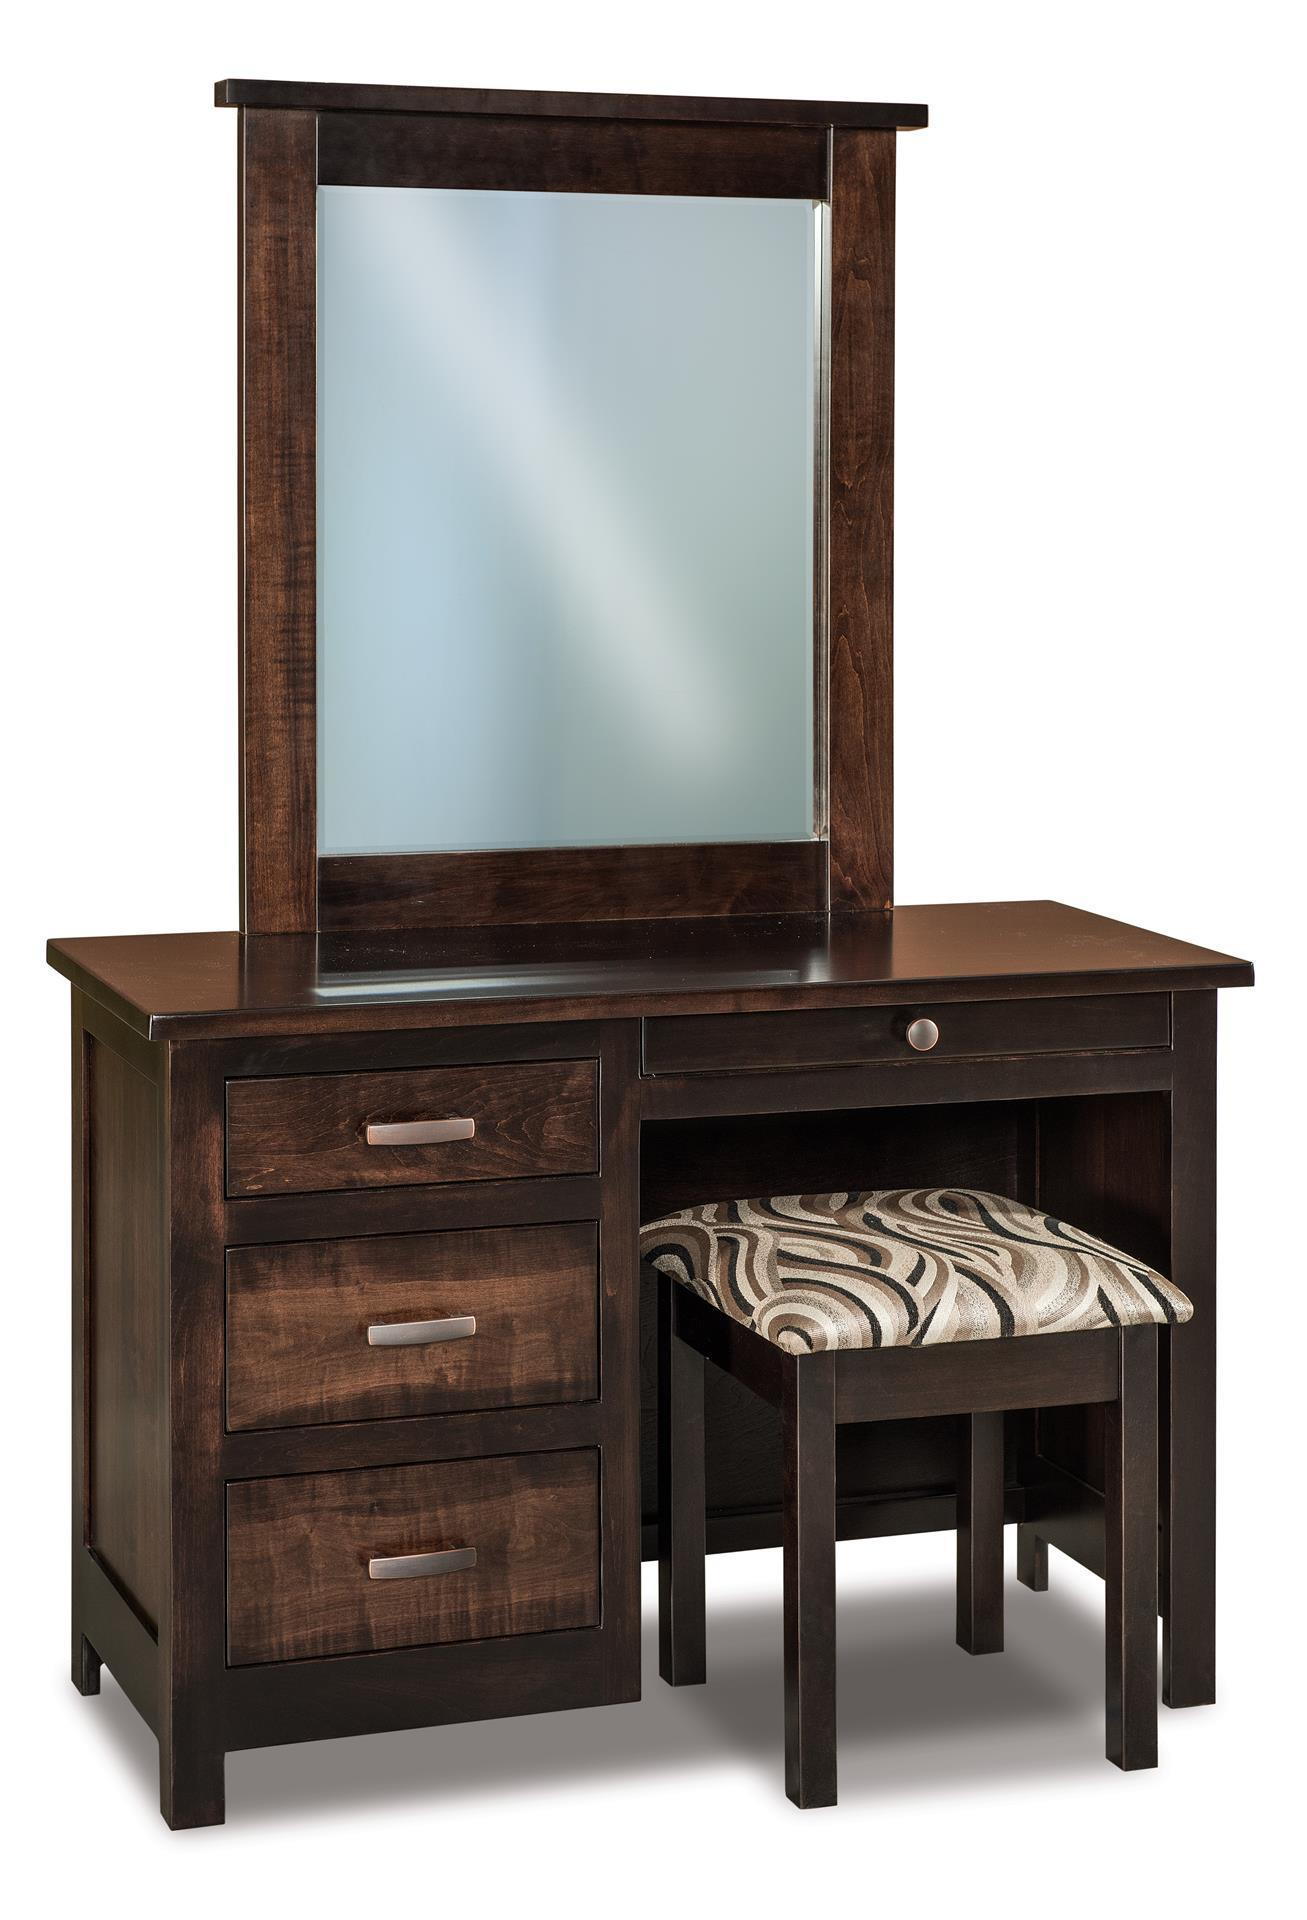 Amish Flush Mission Four Drawer Vanity Dresser From